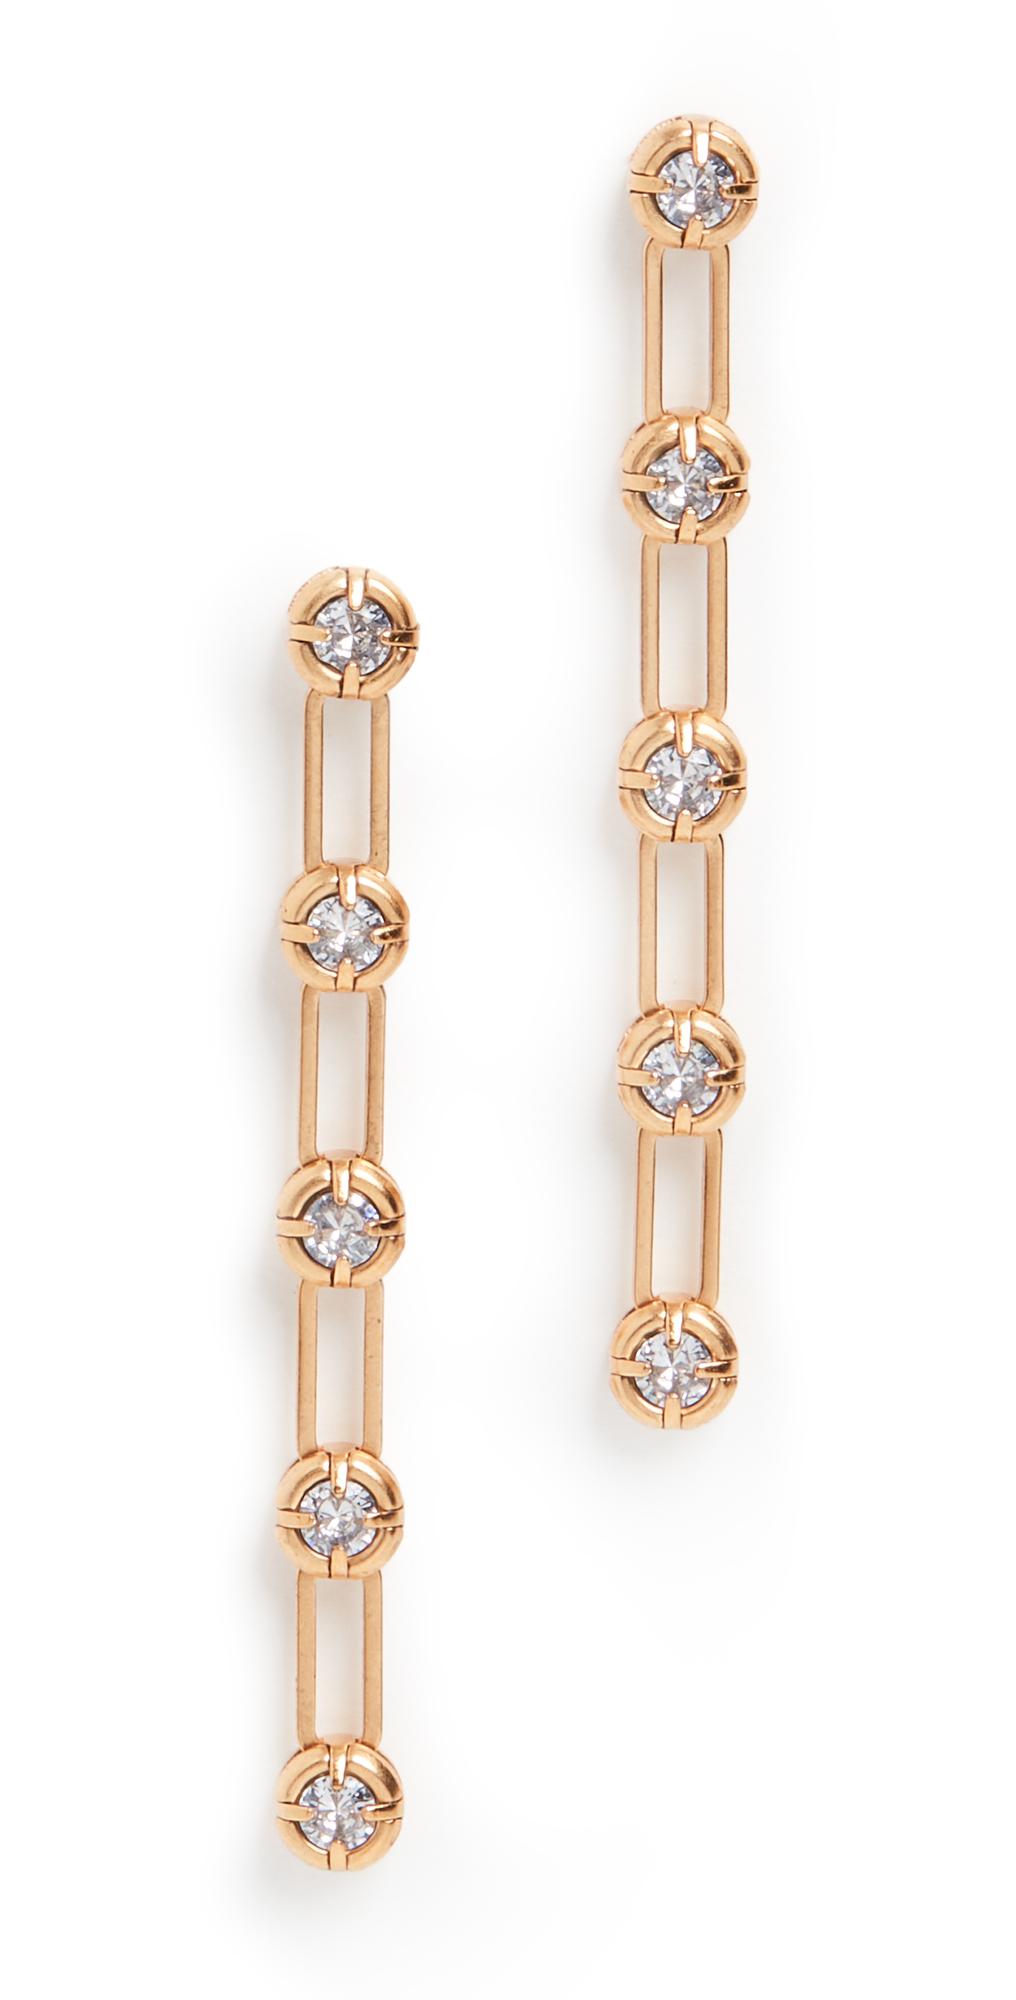 Franny Earrings